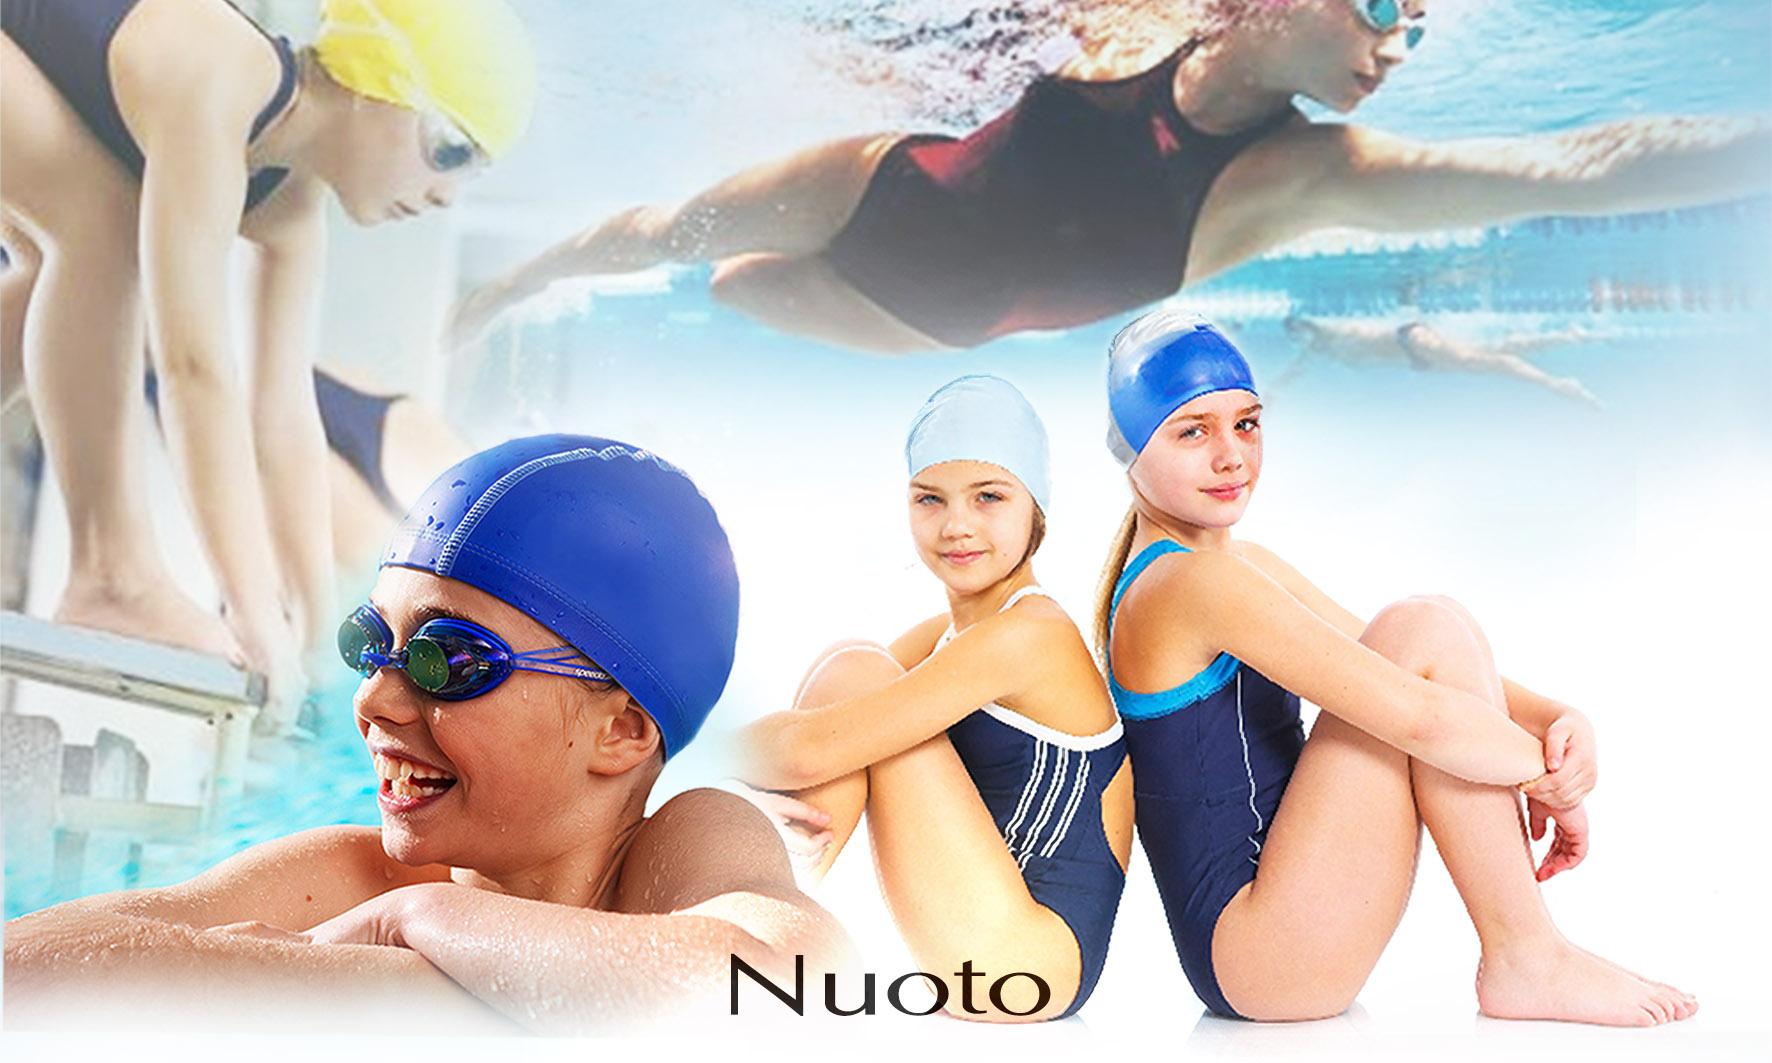 NUOTO_Banner2